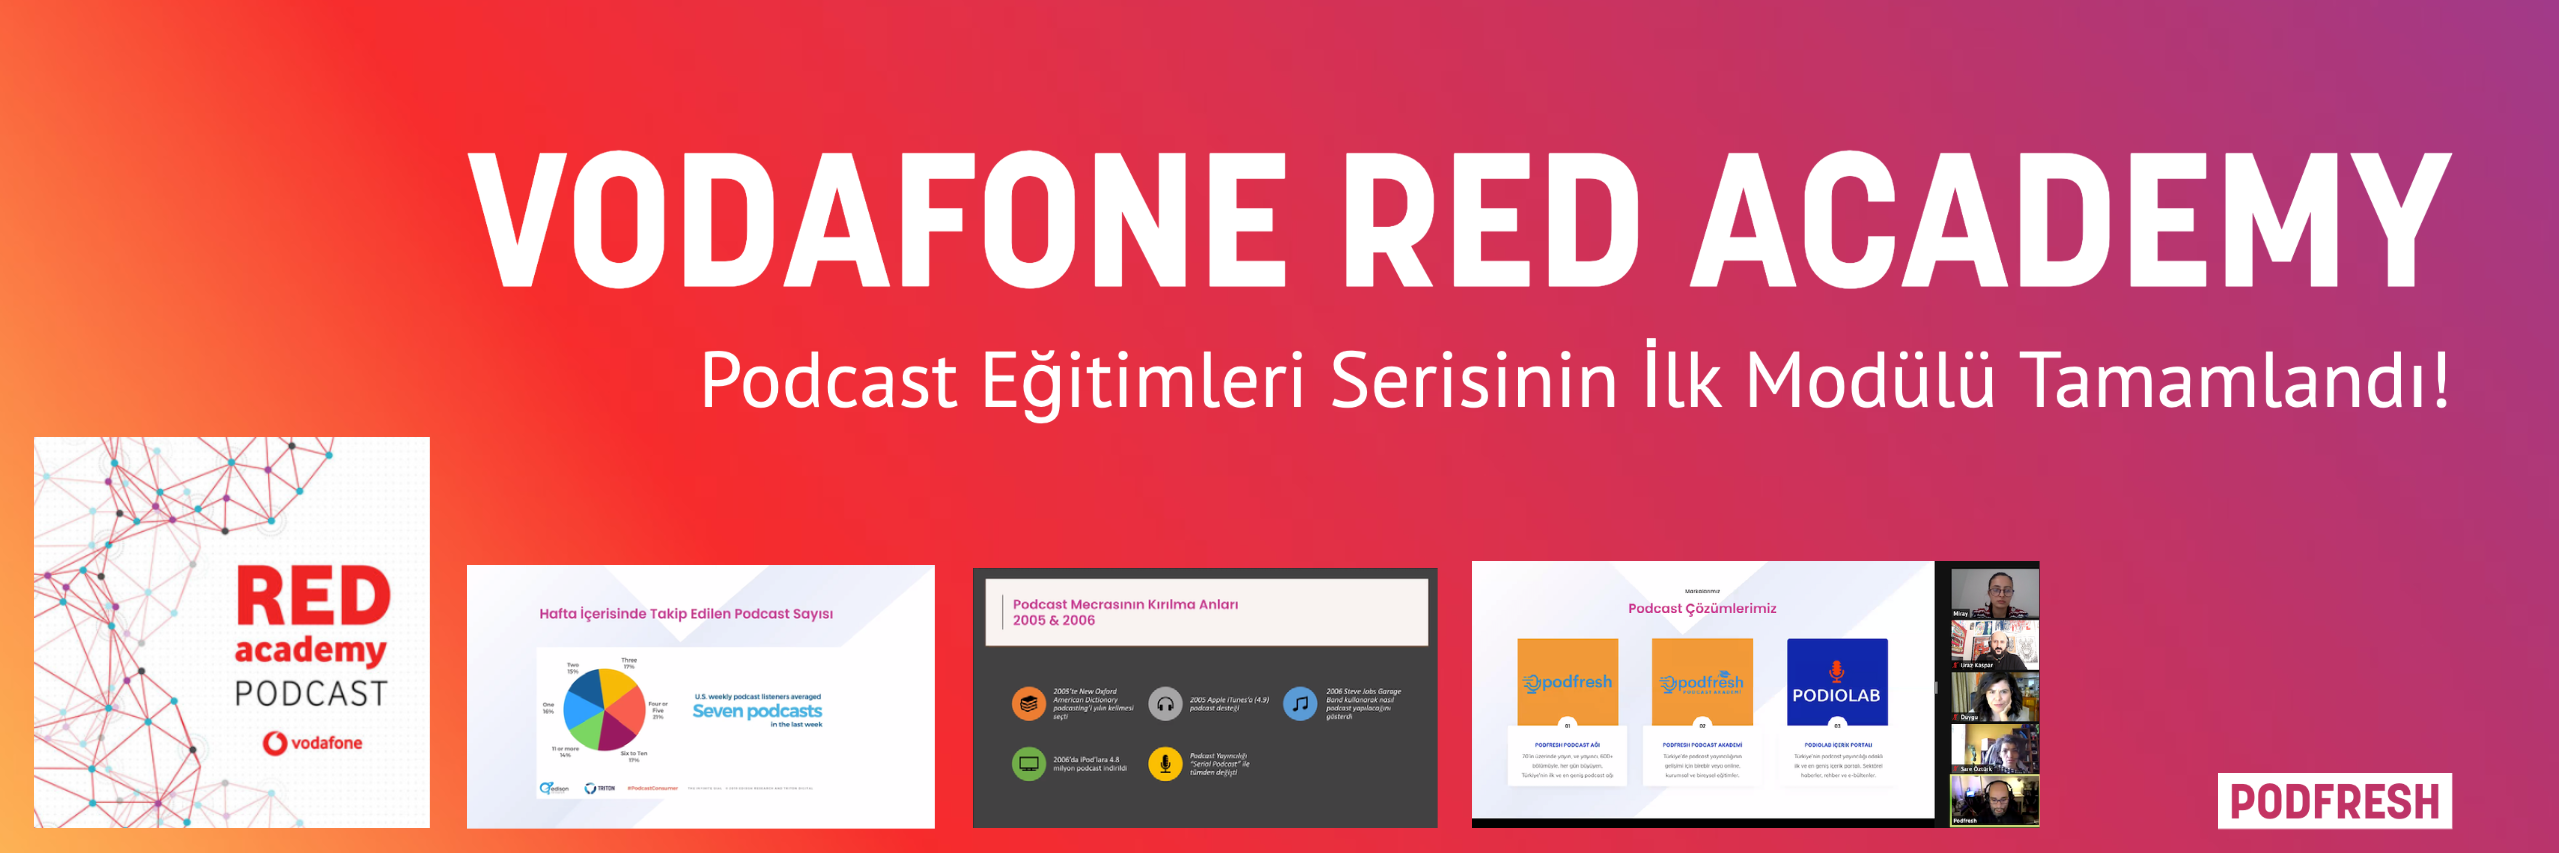 Vodafone Red Academy & Podfresh Podcast Eğitim Serisi